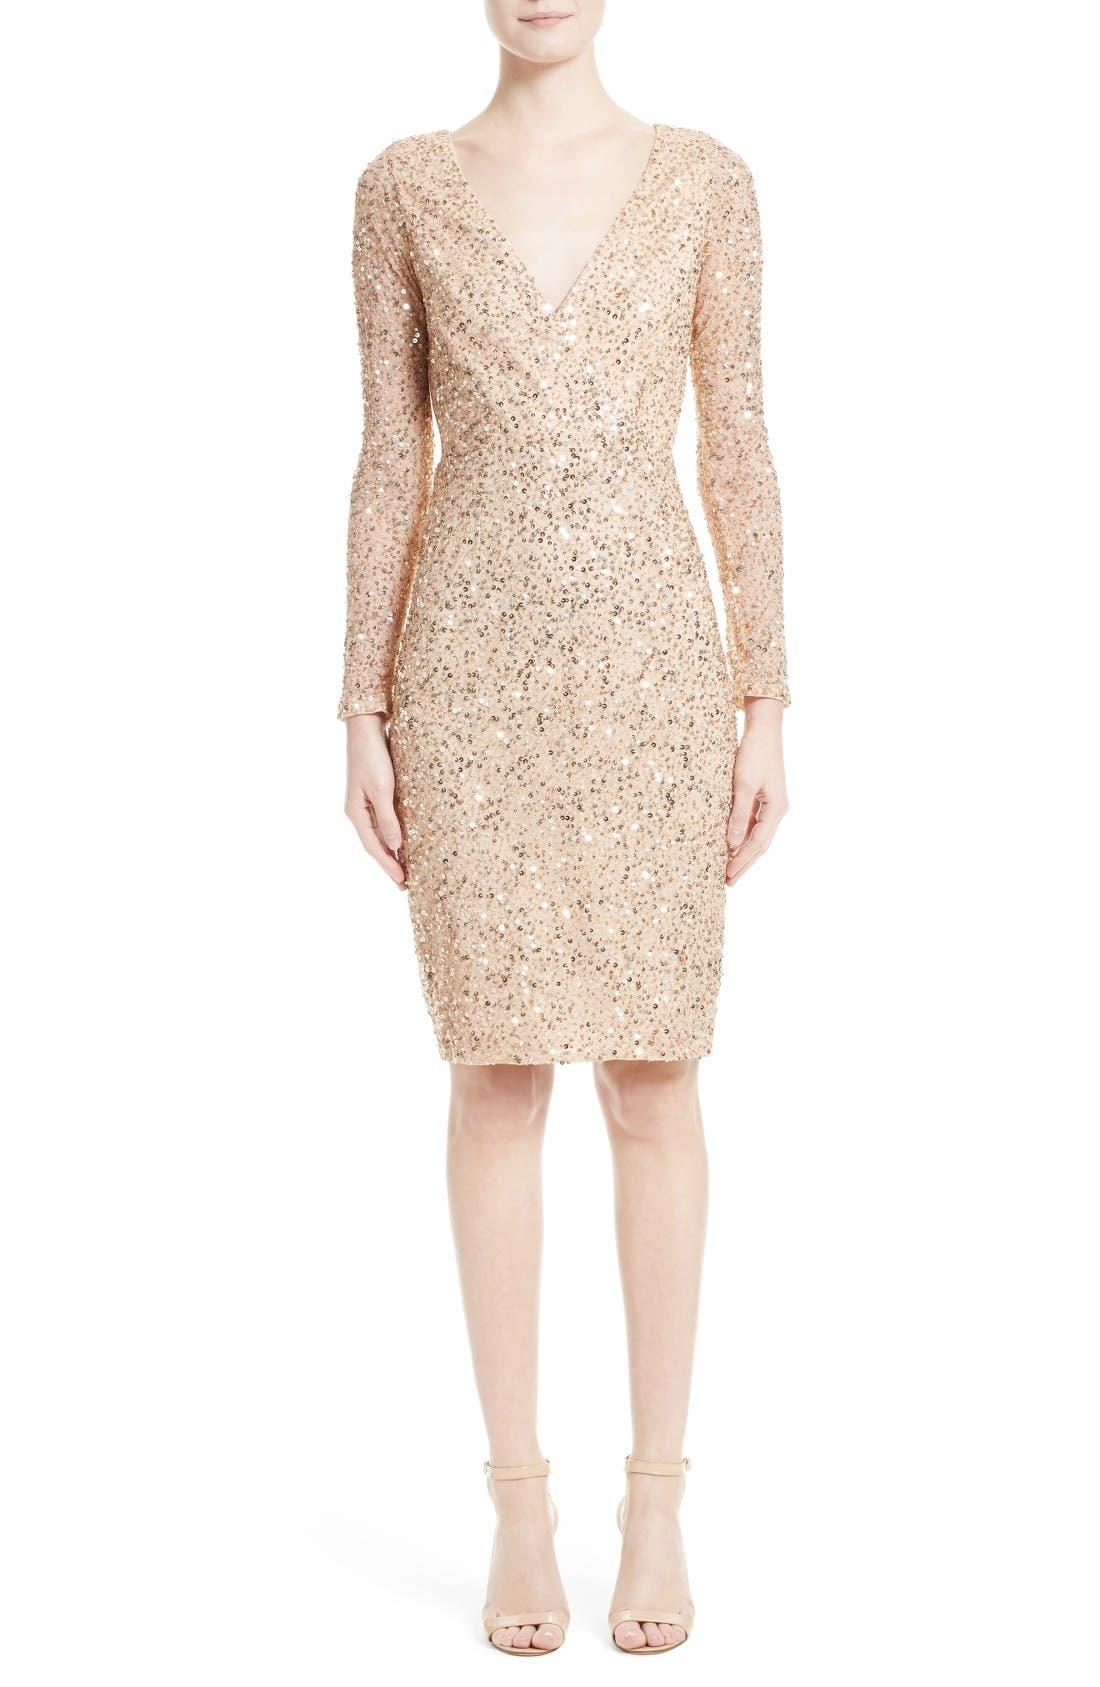 Alternate Image 1 Selected - Rachel Gilbert Sequin Body-Con Dress